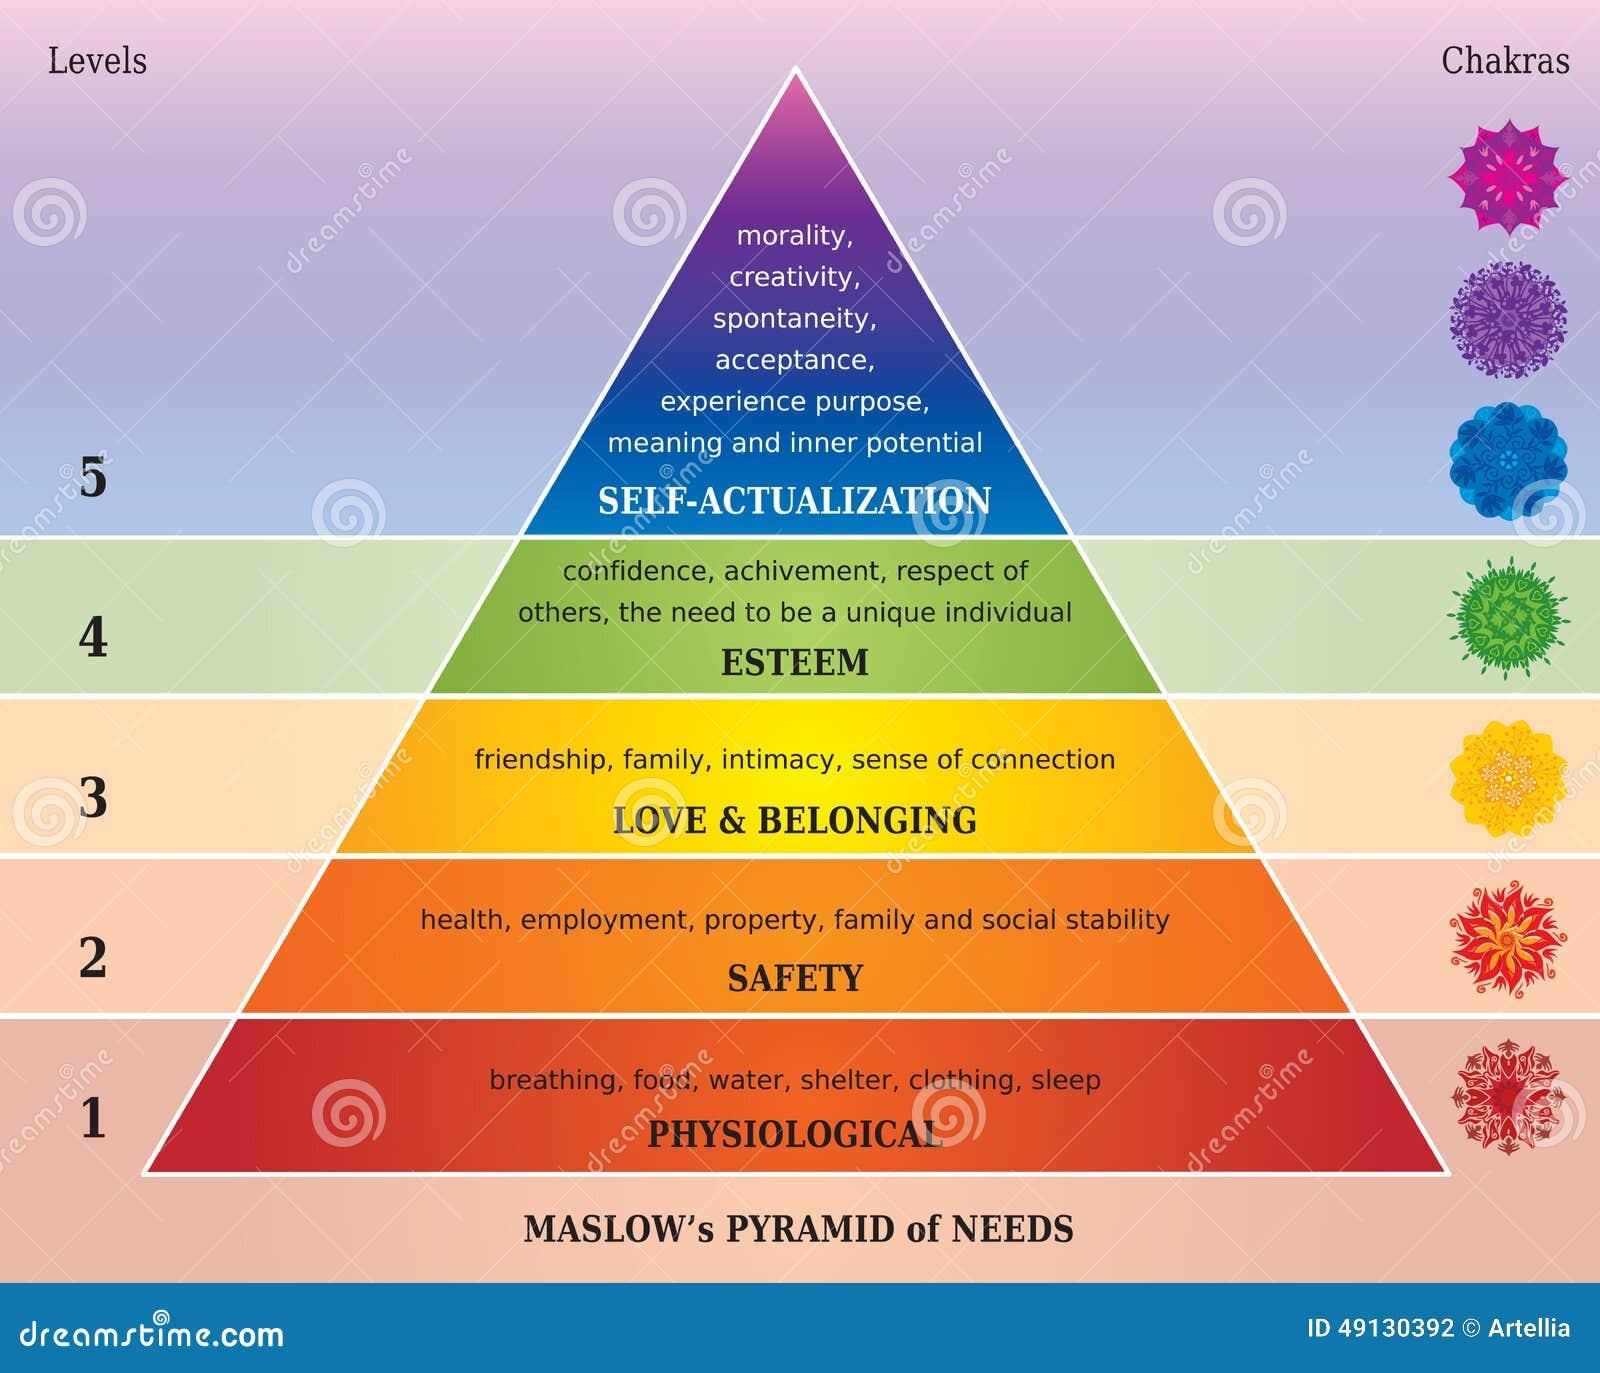 maslows pyramid needs diagram chakras rainbow colors mandalas 49130392 maslows pyramid of needs diagram with chakras in rainbow colors